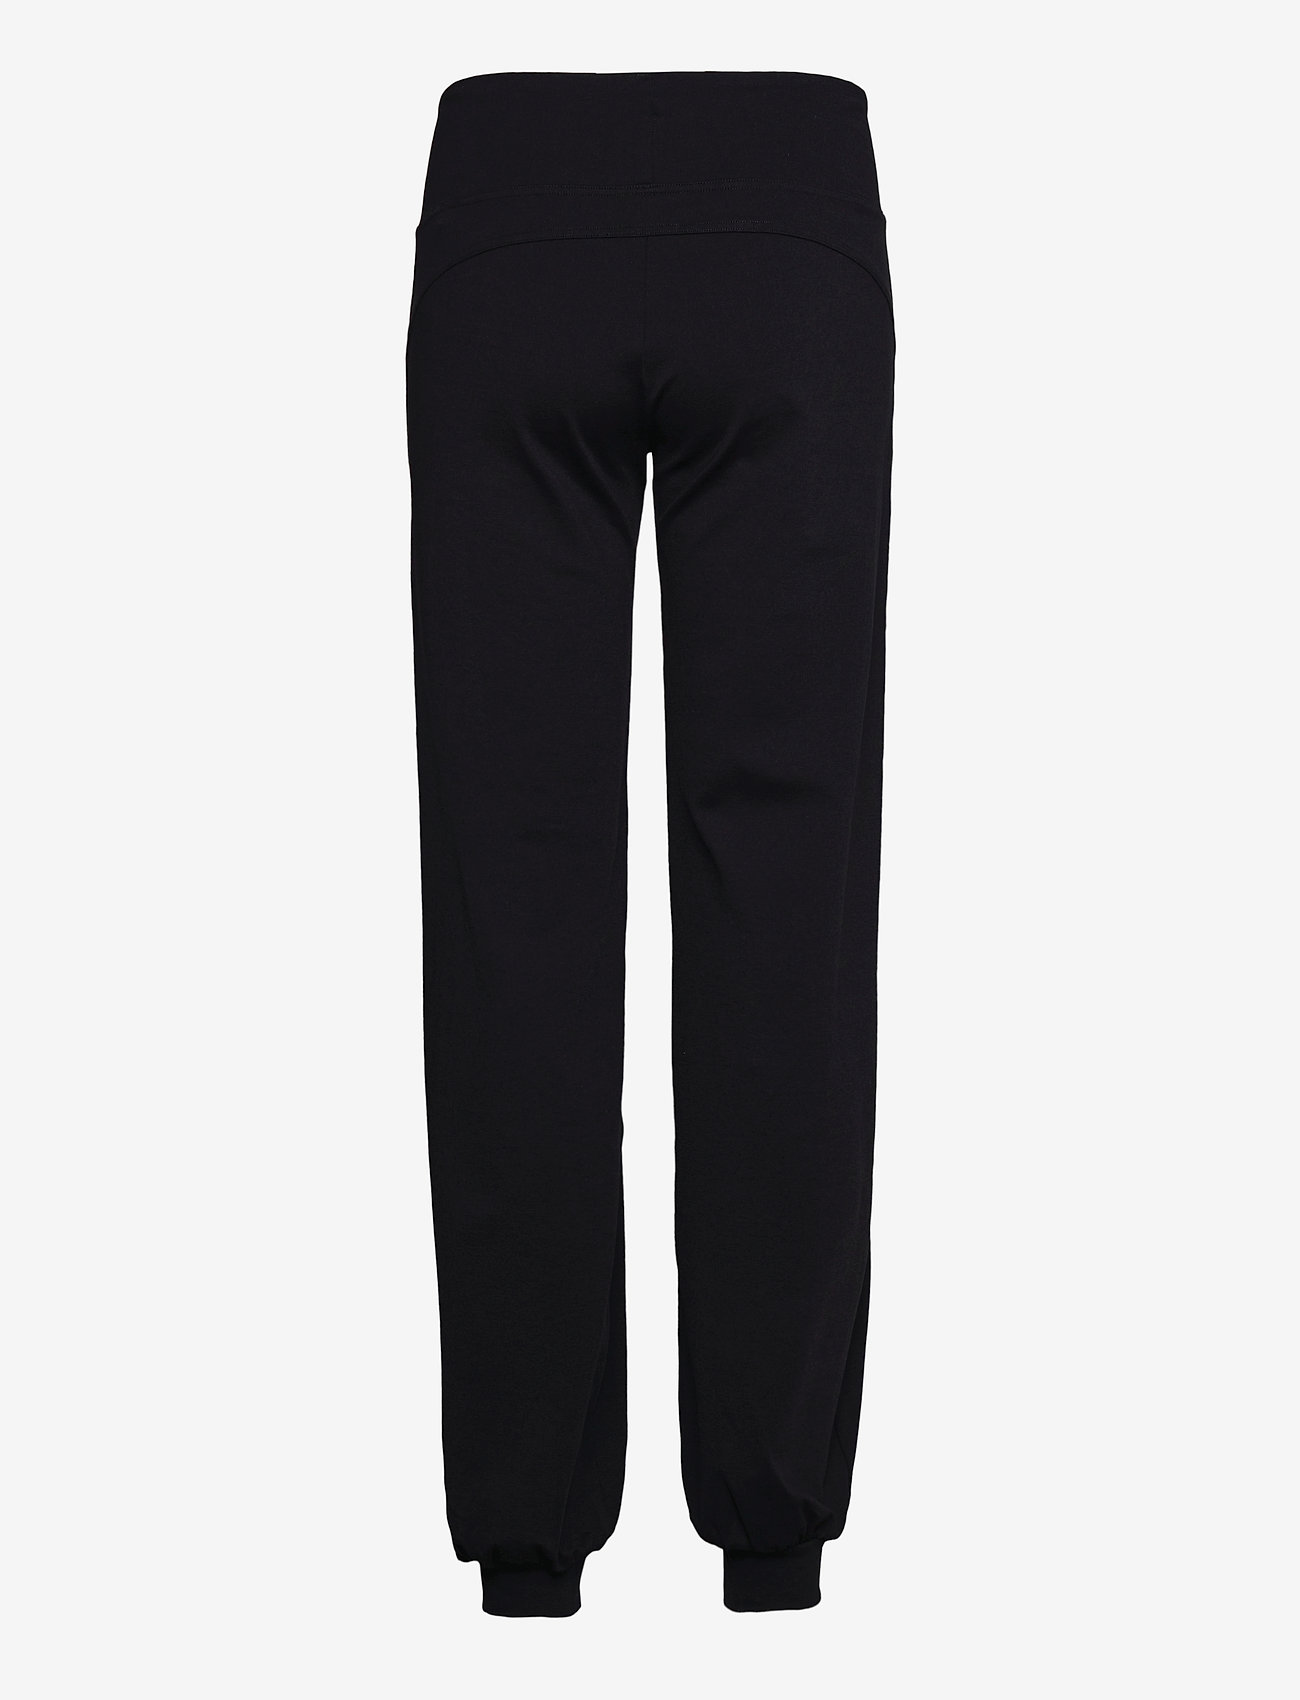 Casall - Plow pants - spodnie treningowe - black - 1